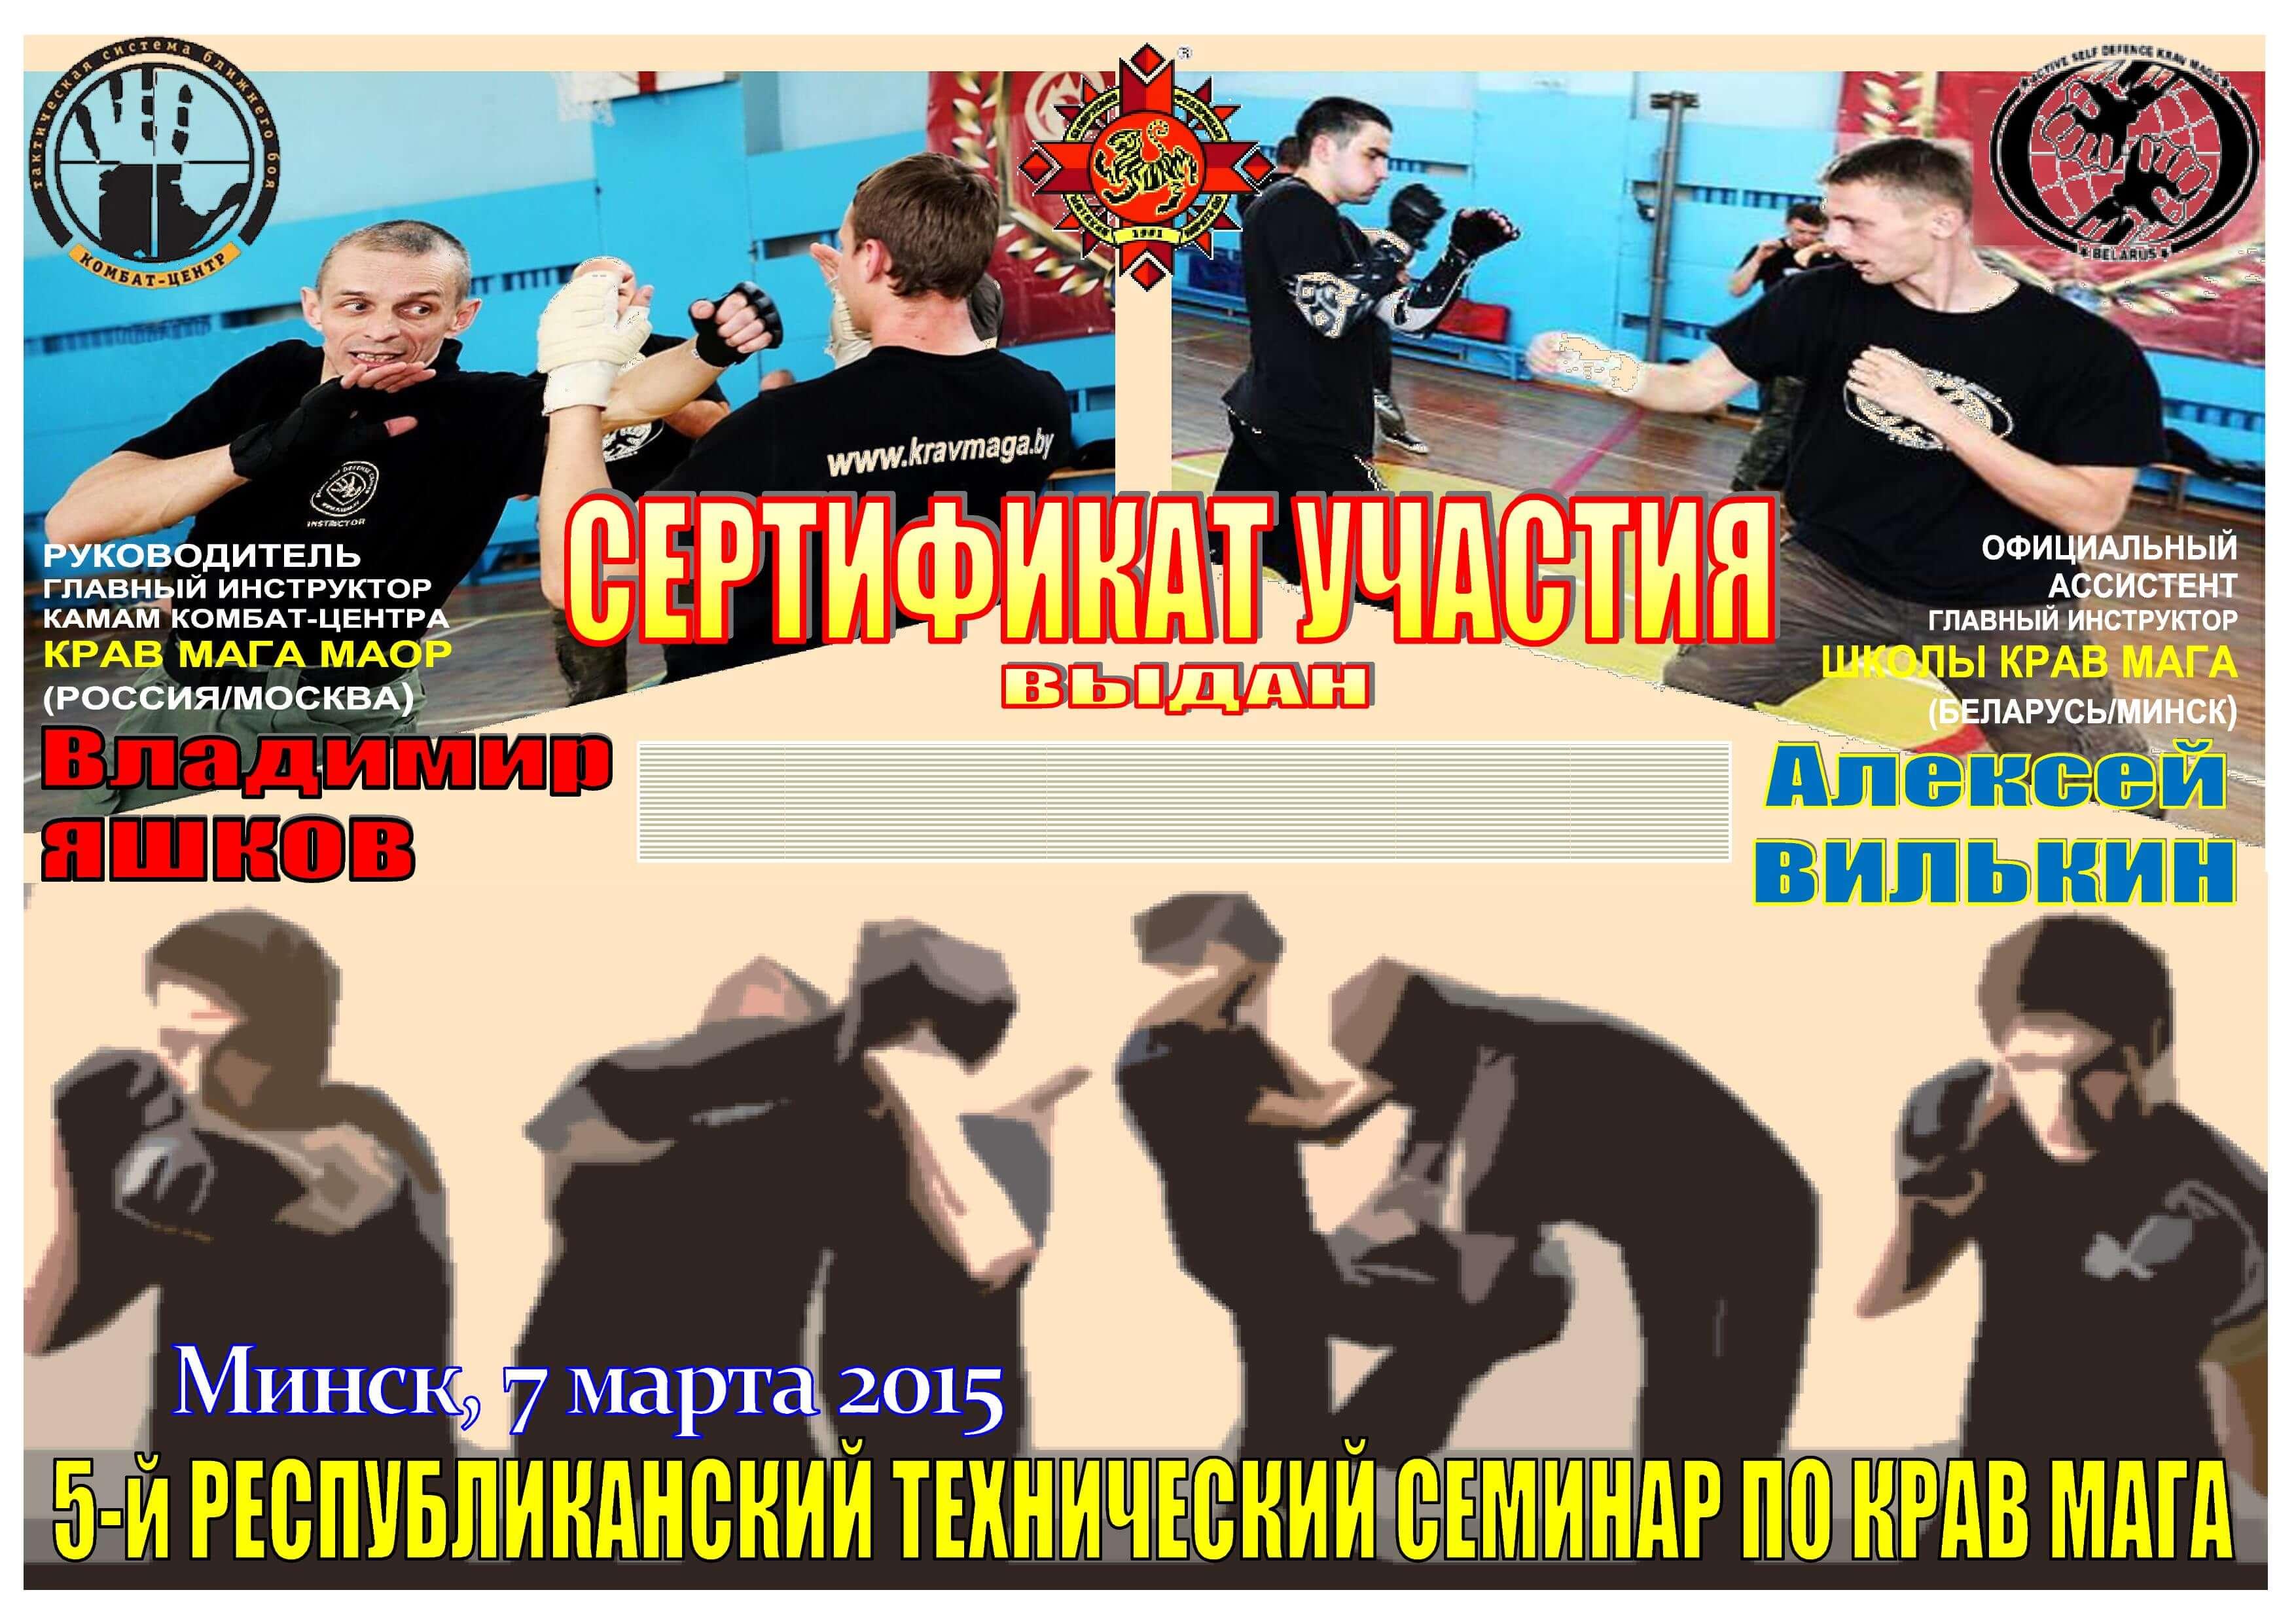 Семинар В.Яшкова-2015 Сертификат